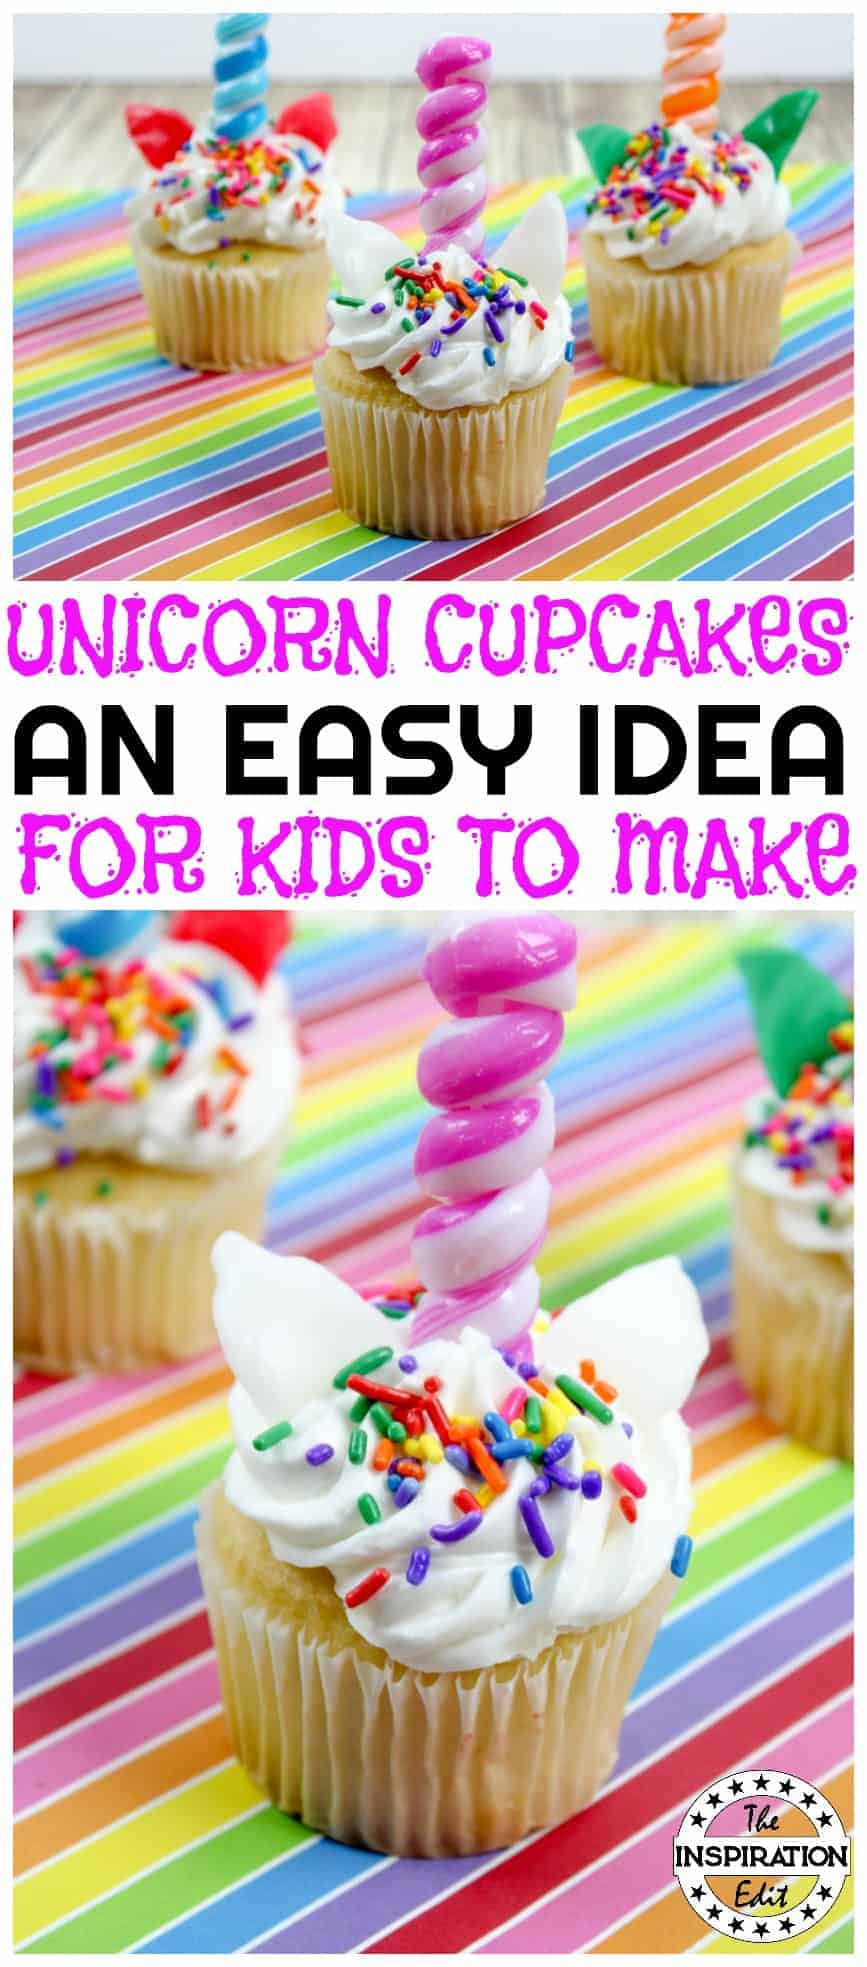 unicorn cupcakes tutorial a great unicorn party food idea